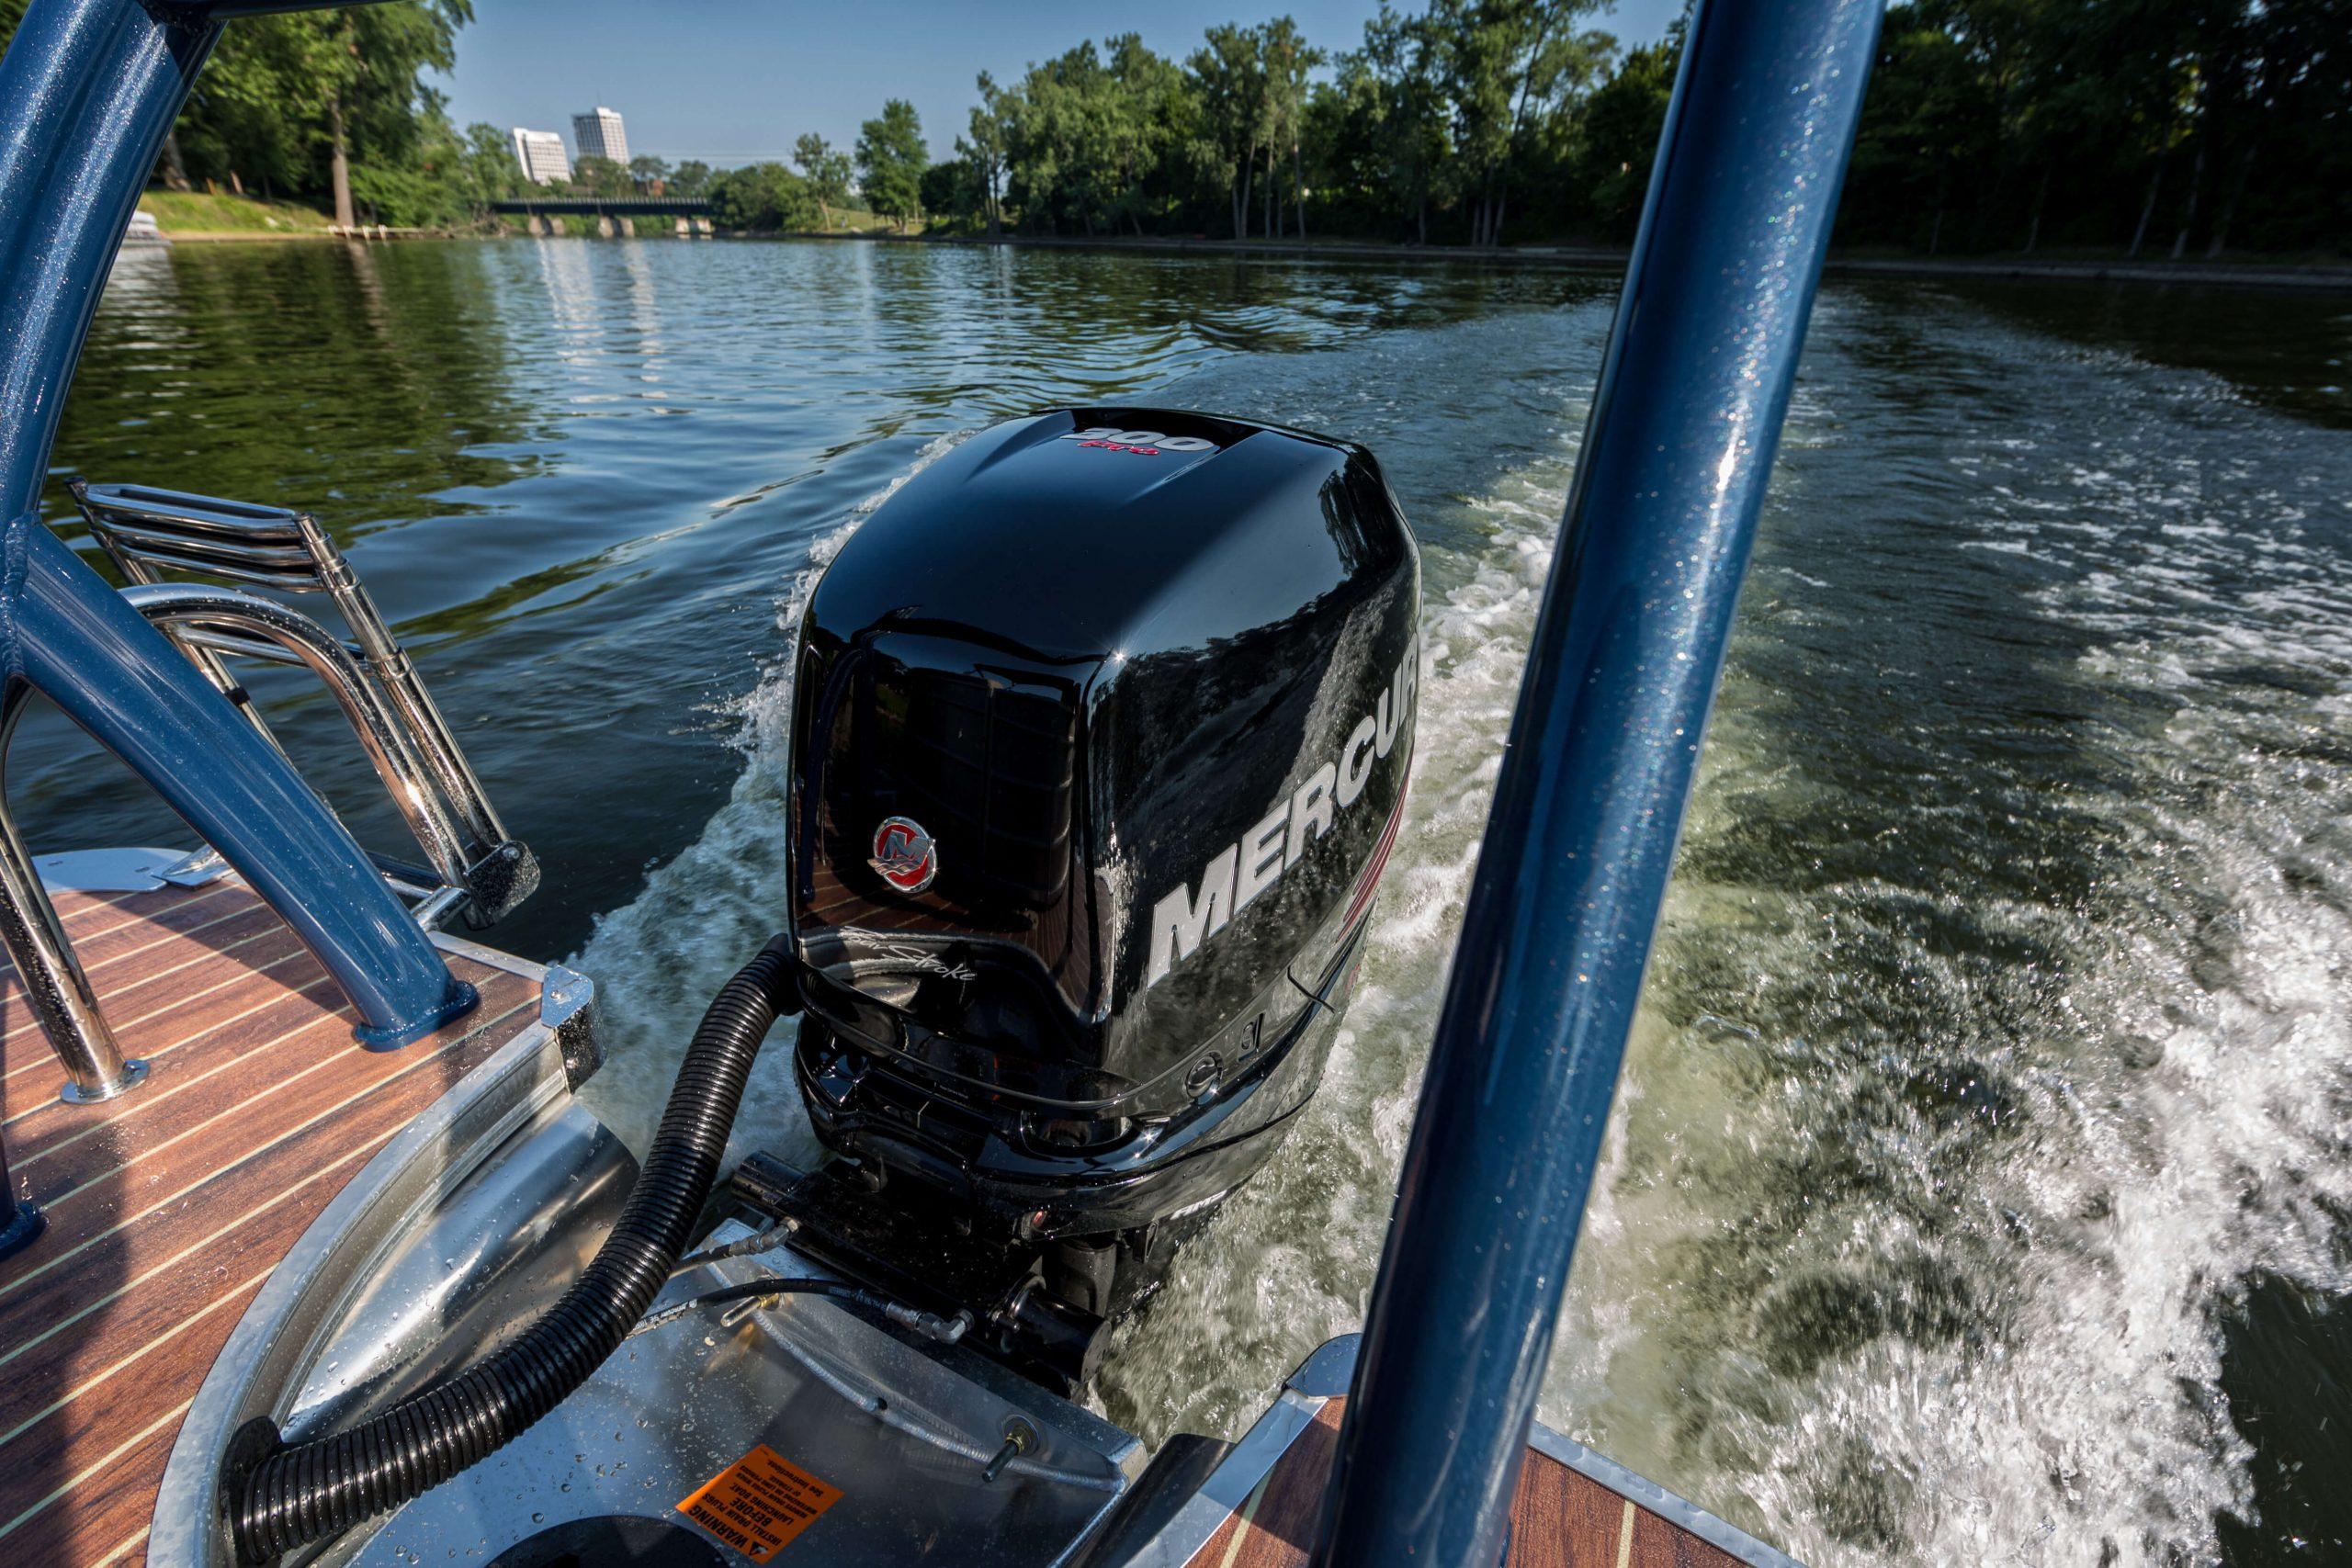 Mercury Outboard w fuel line